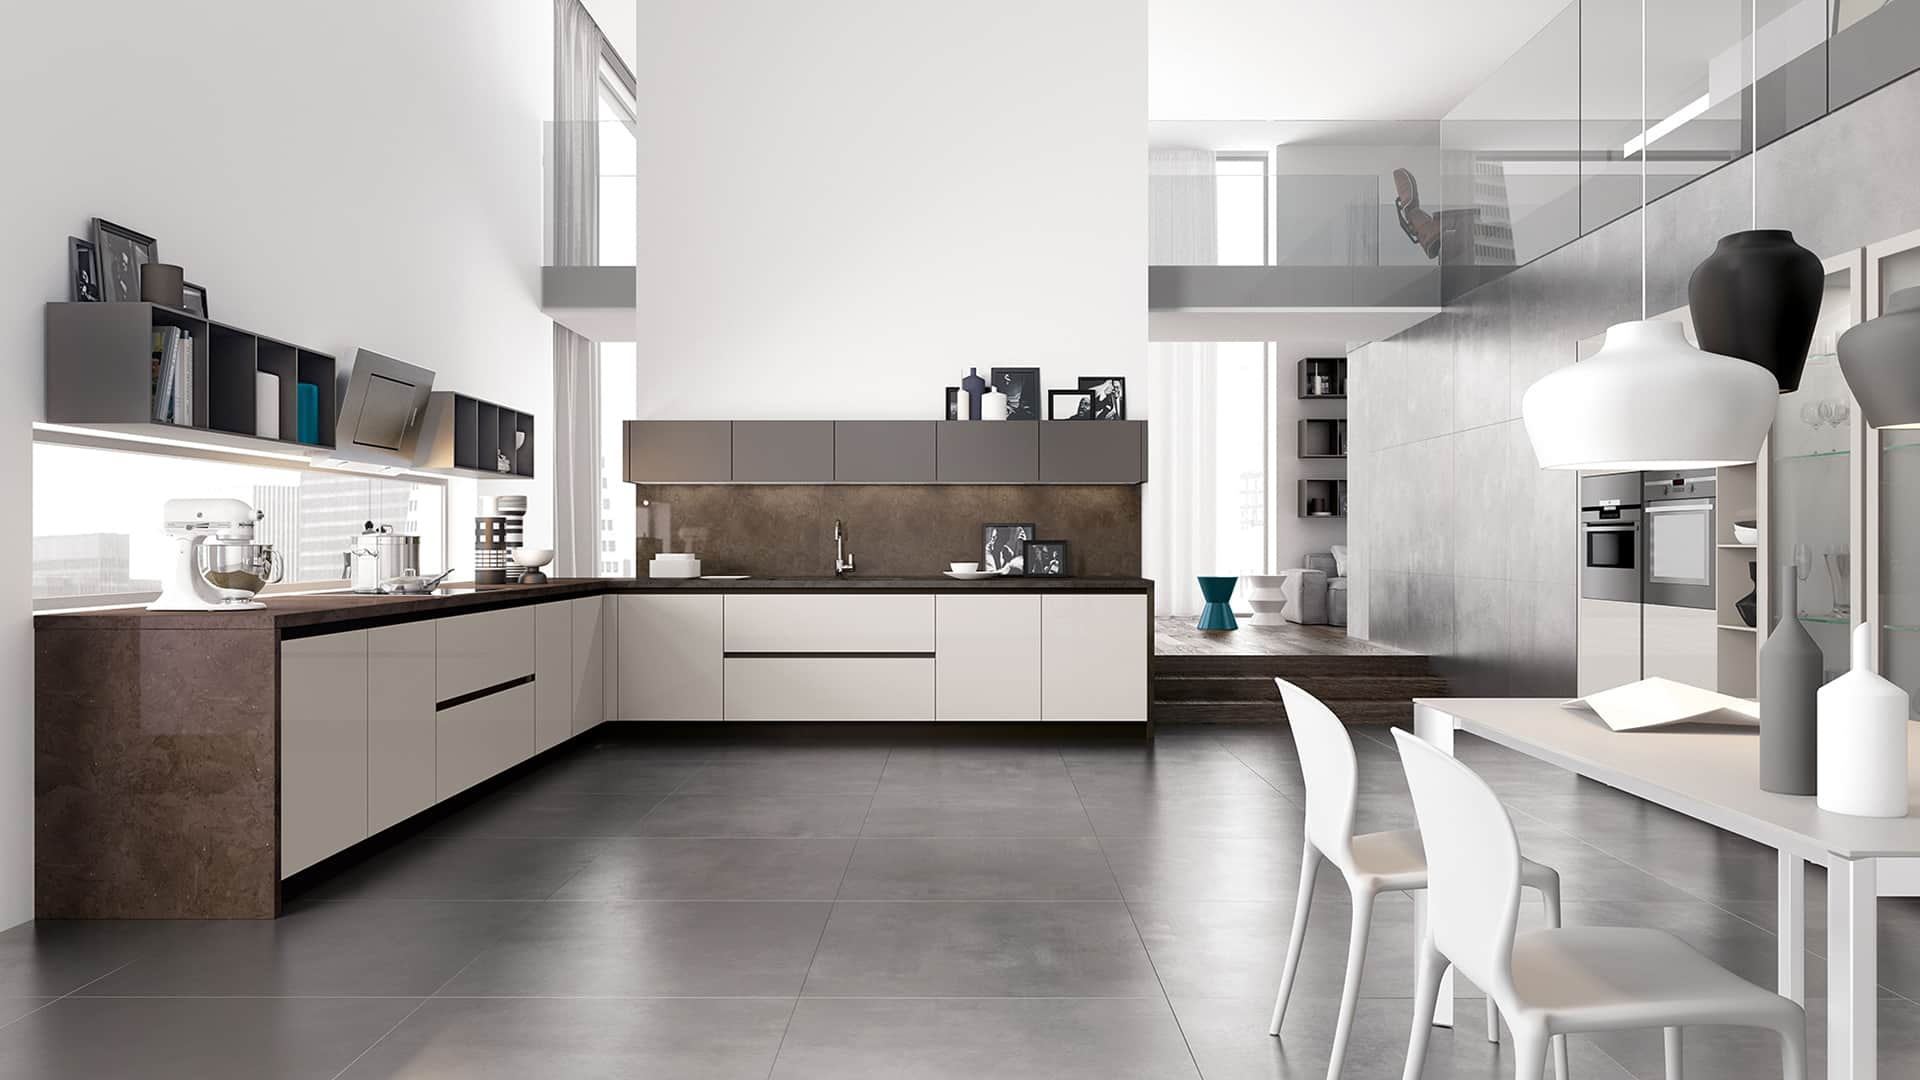 Mensole cucina moderna idee di design per la casa - Mensole per cucina moderna ...